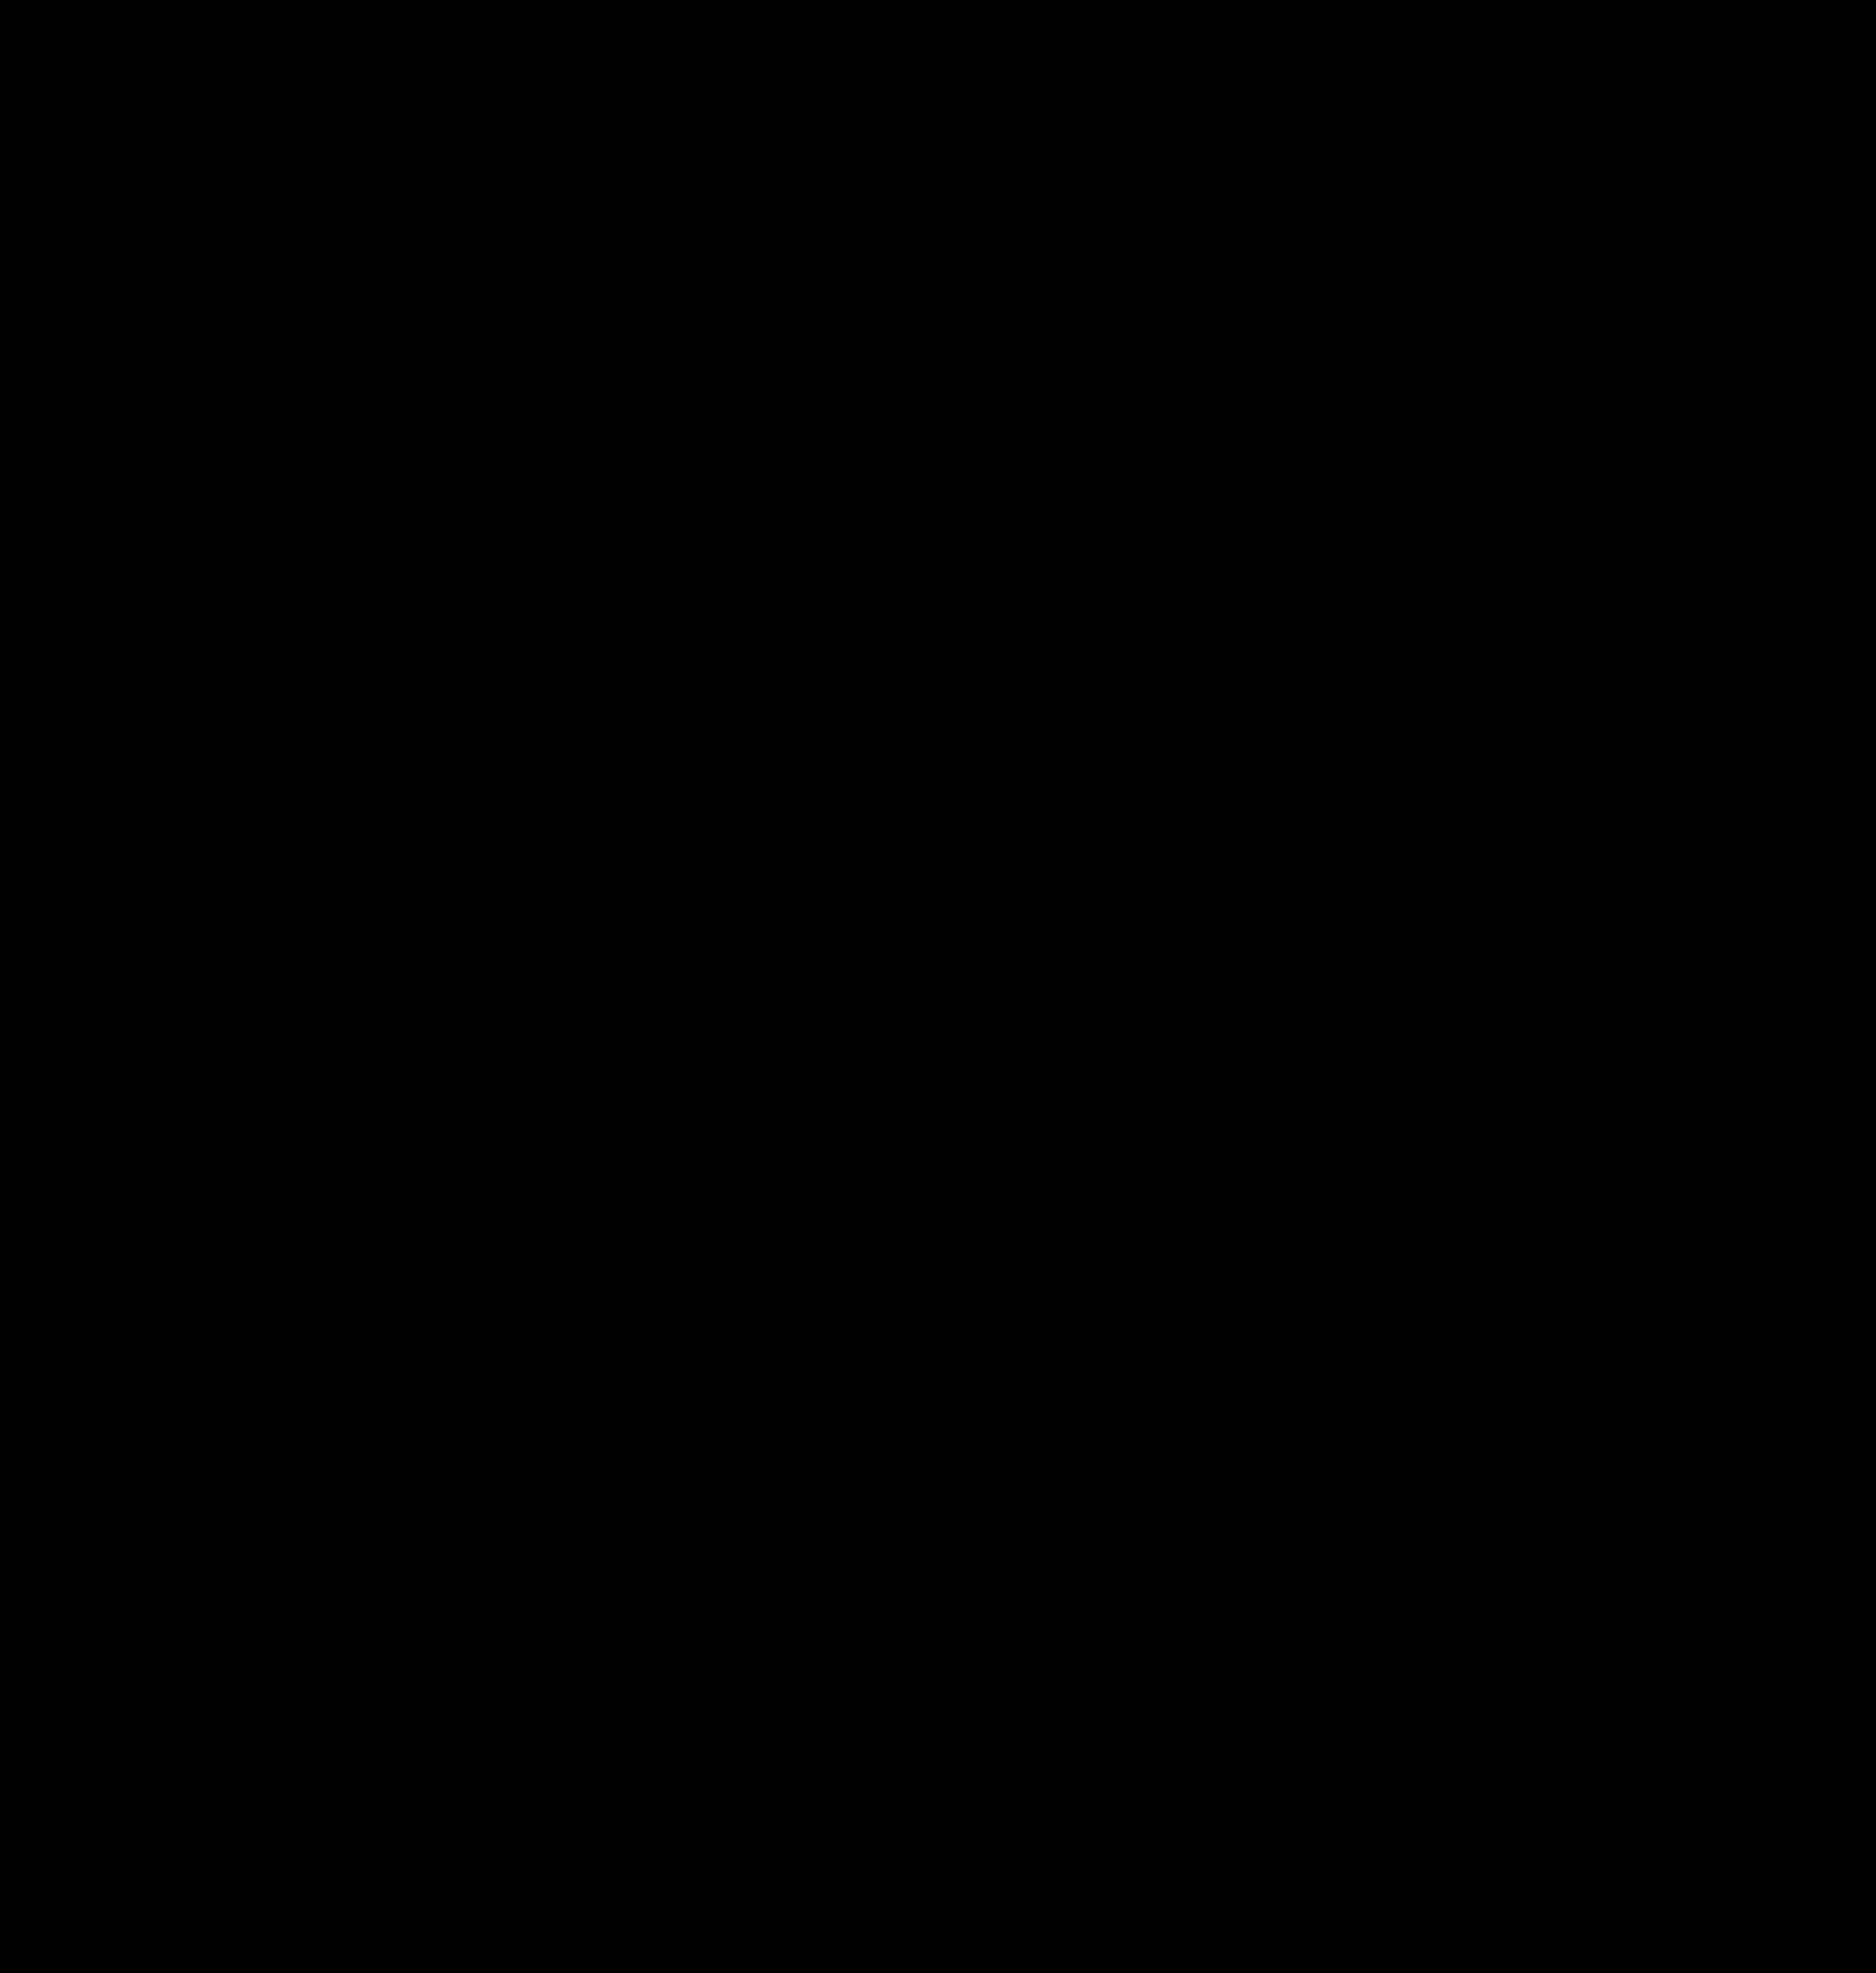 Circle Ornament Vector DXF Patterns | FreePatternsArea